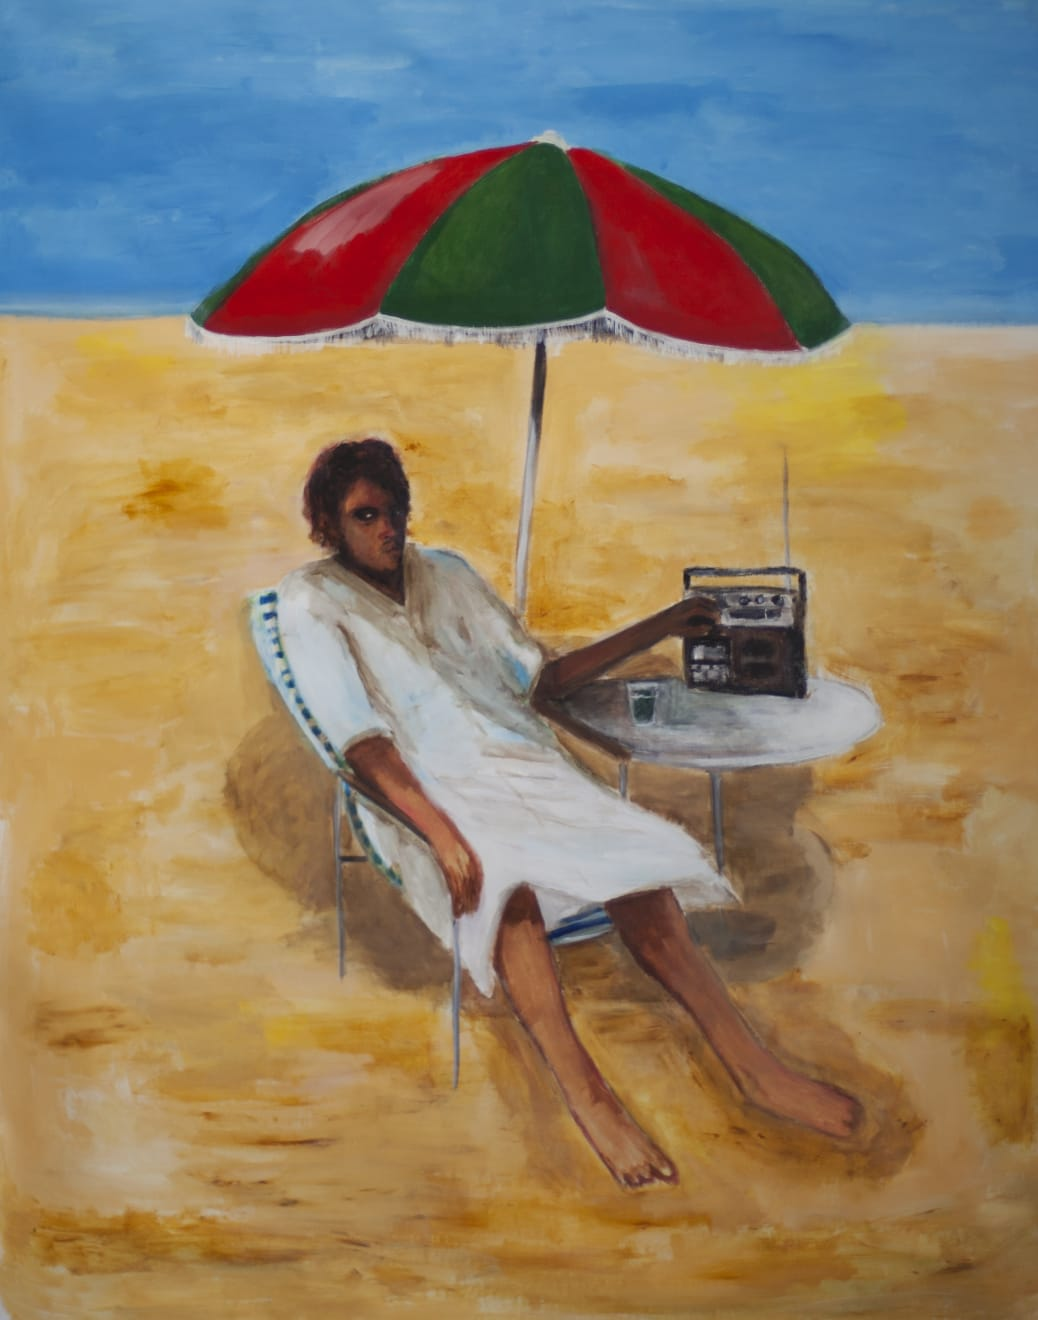 Anuar Khalifi, Ghurba, 2020, Acrylic on canvas, 112 x 137cm EUR 8,000 (Excluding VAT)